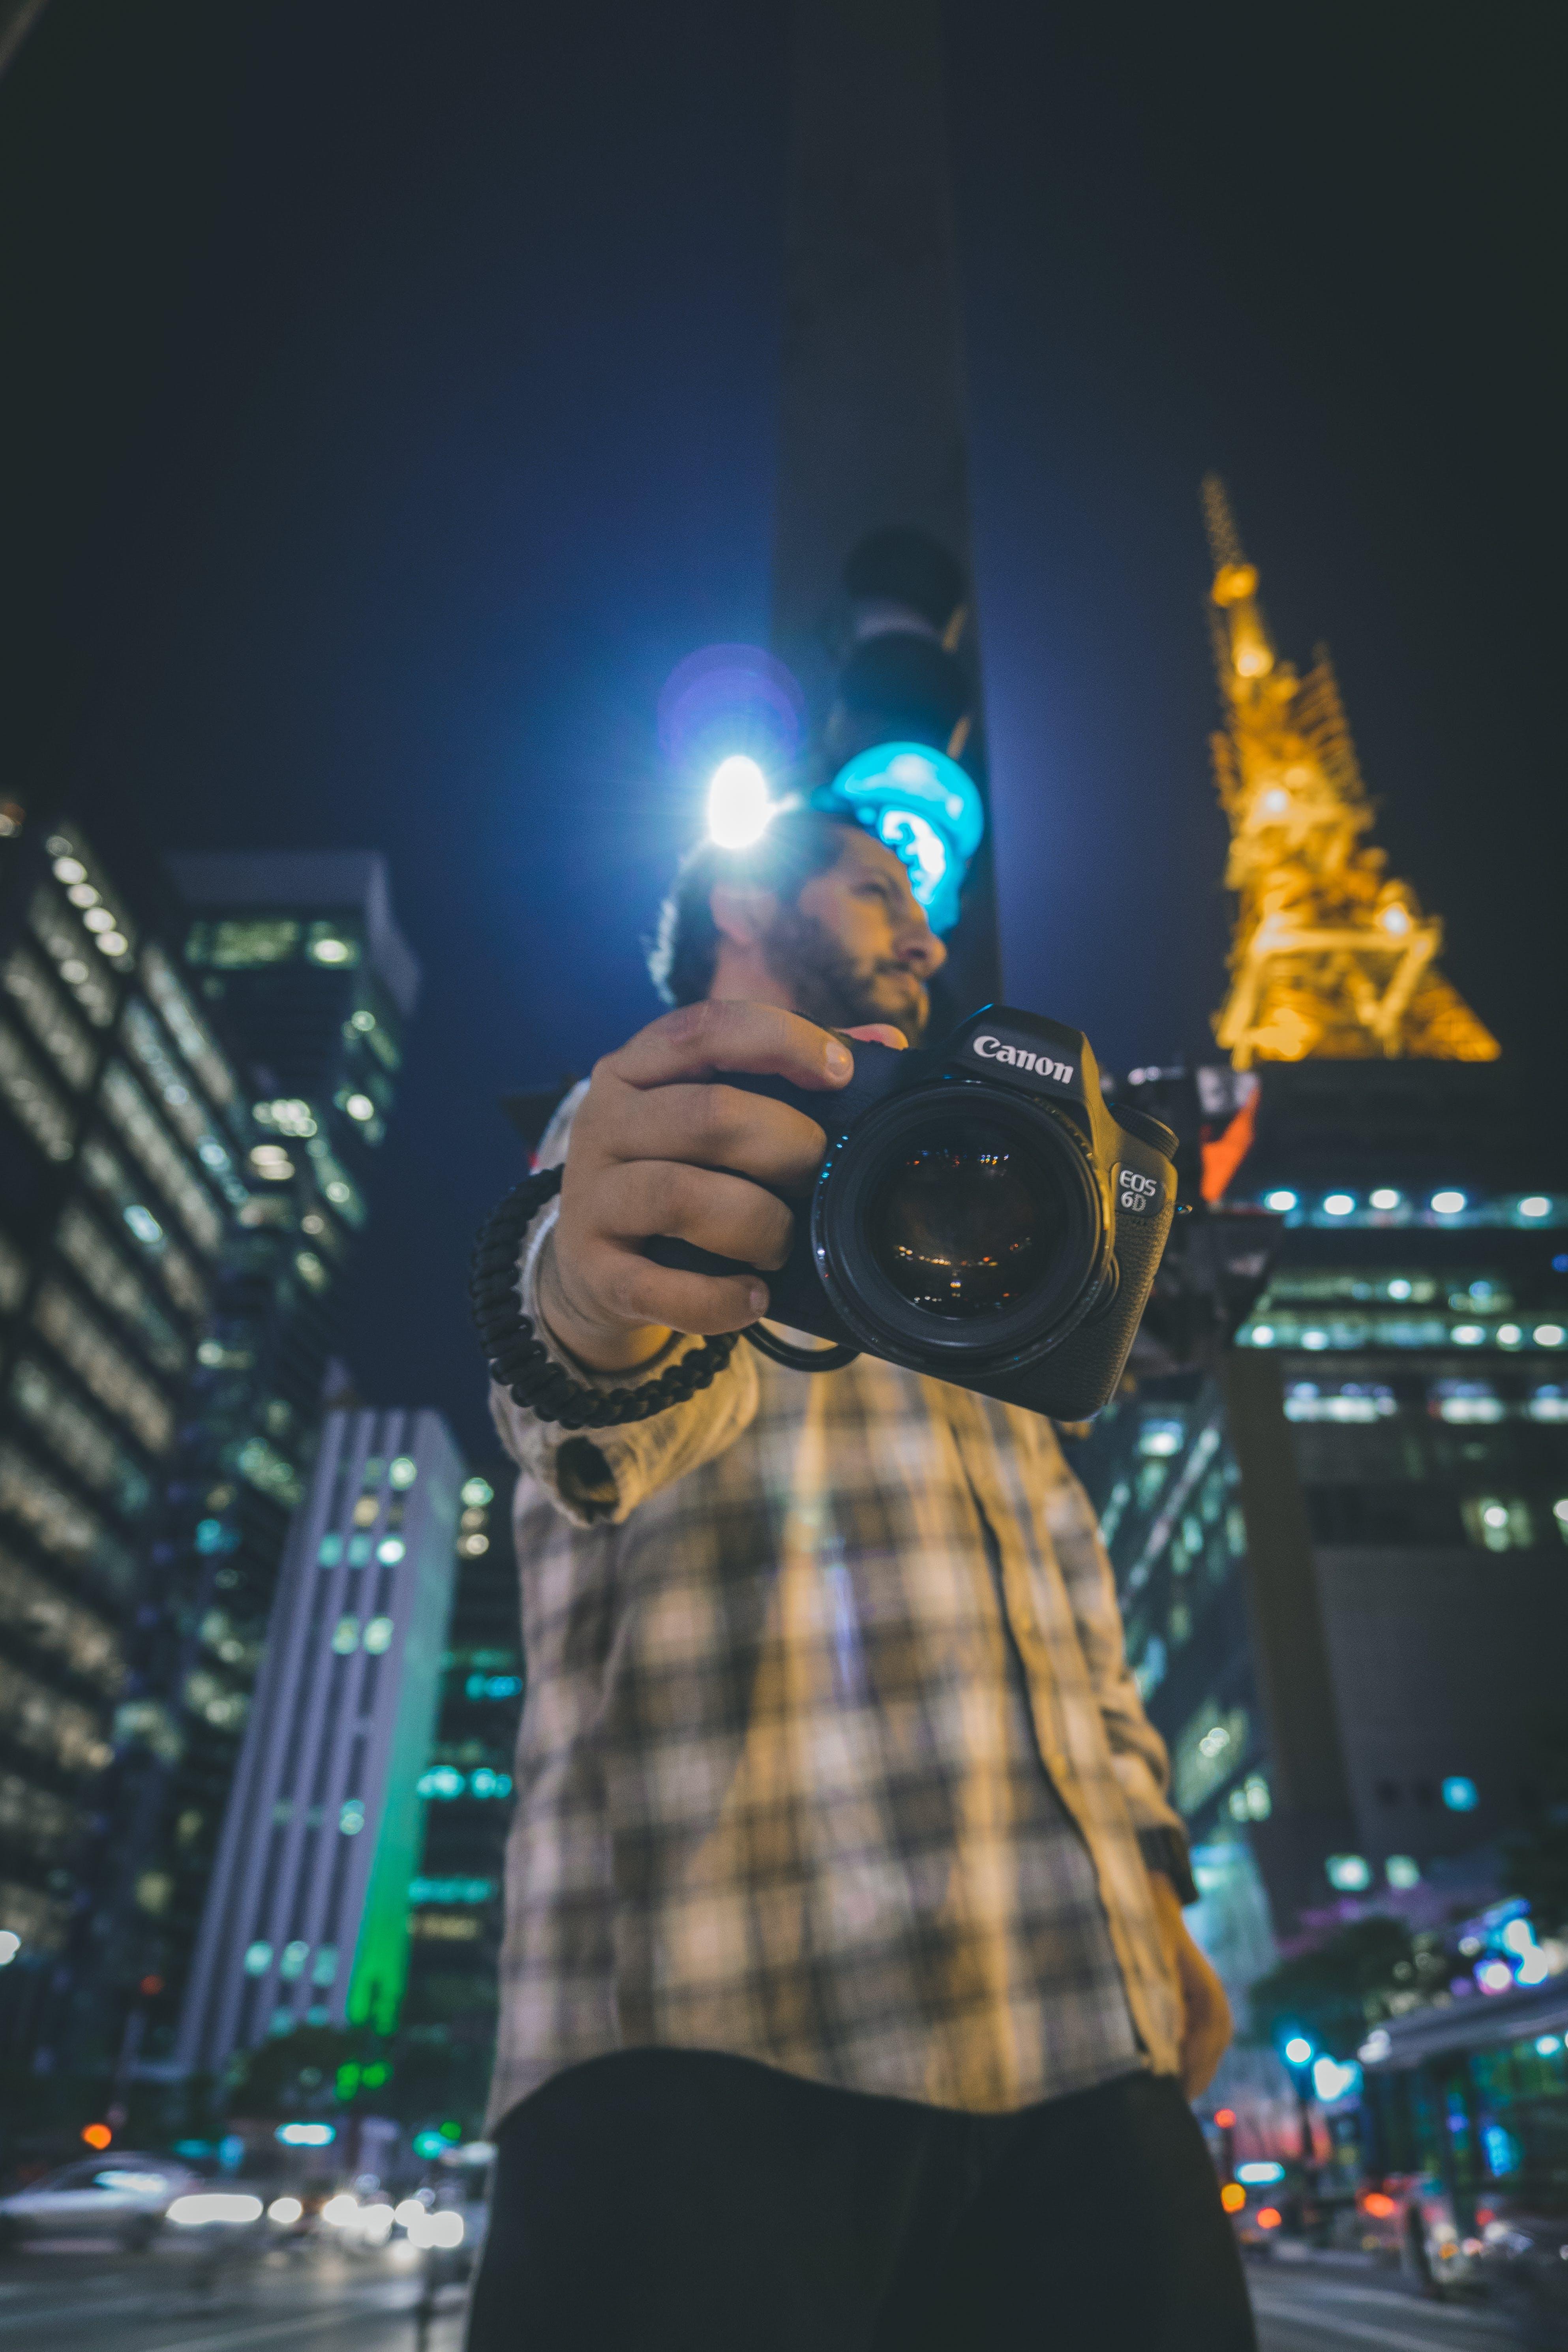 Man Holding Canon Dlsr Camera